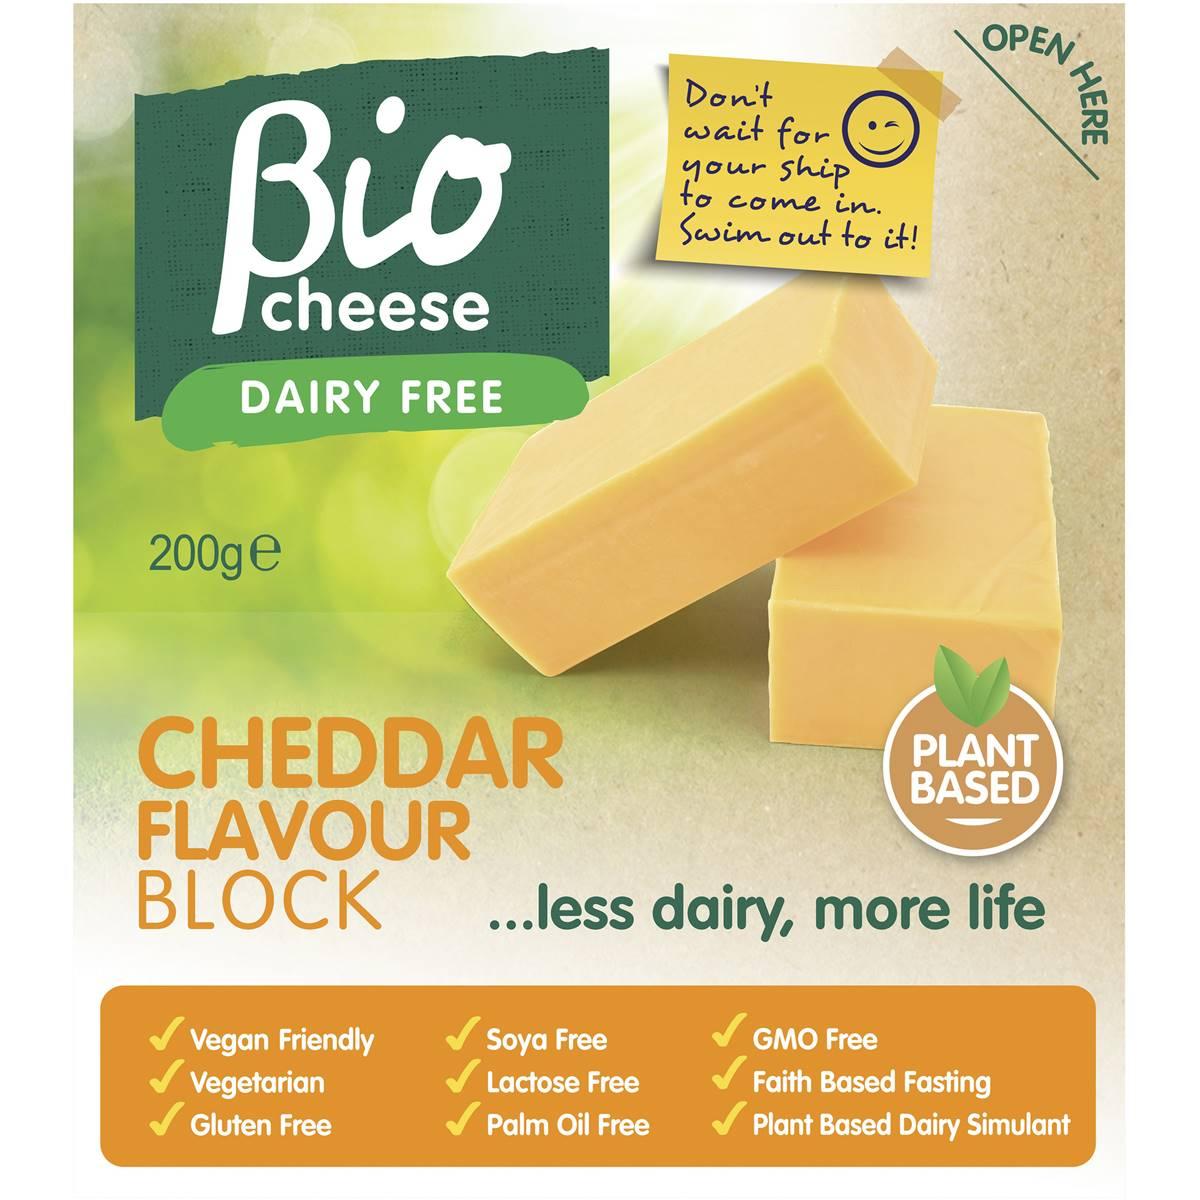 quake 4 crack mac and cheese